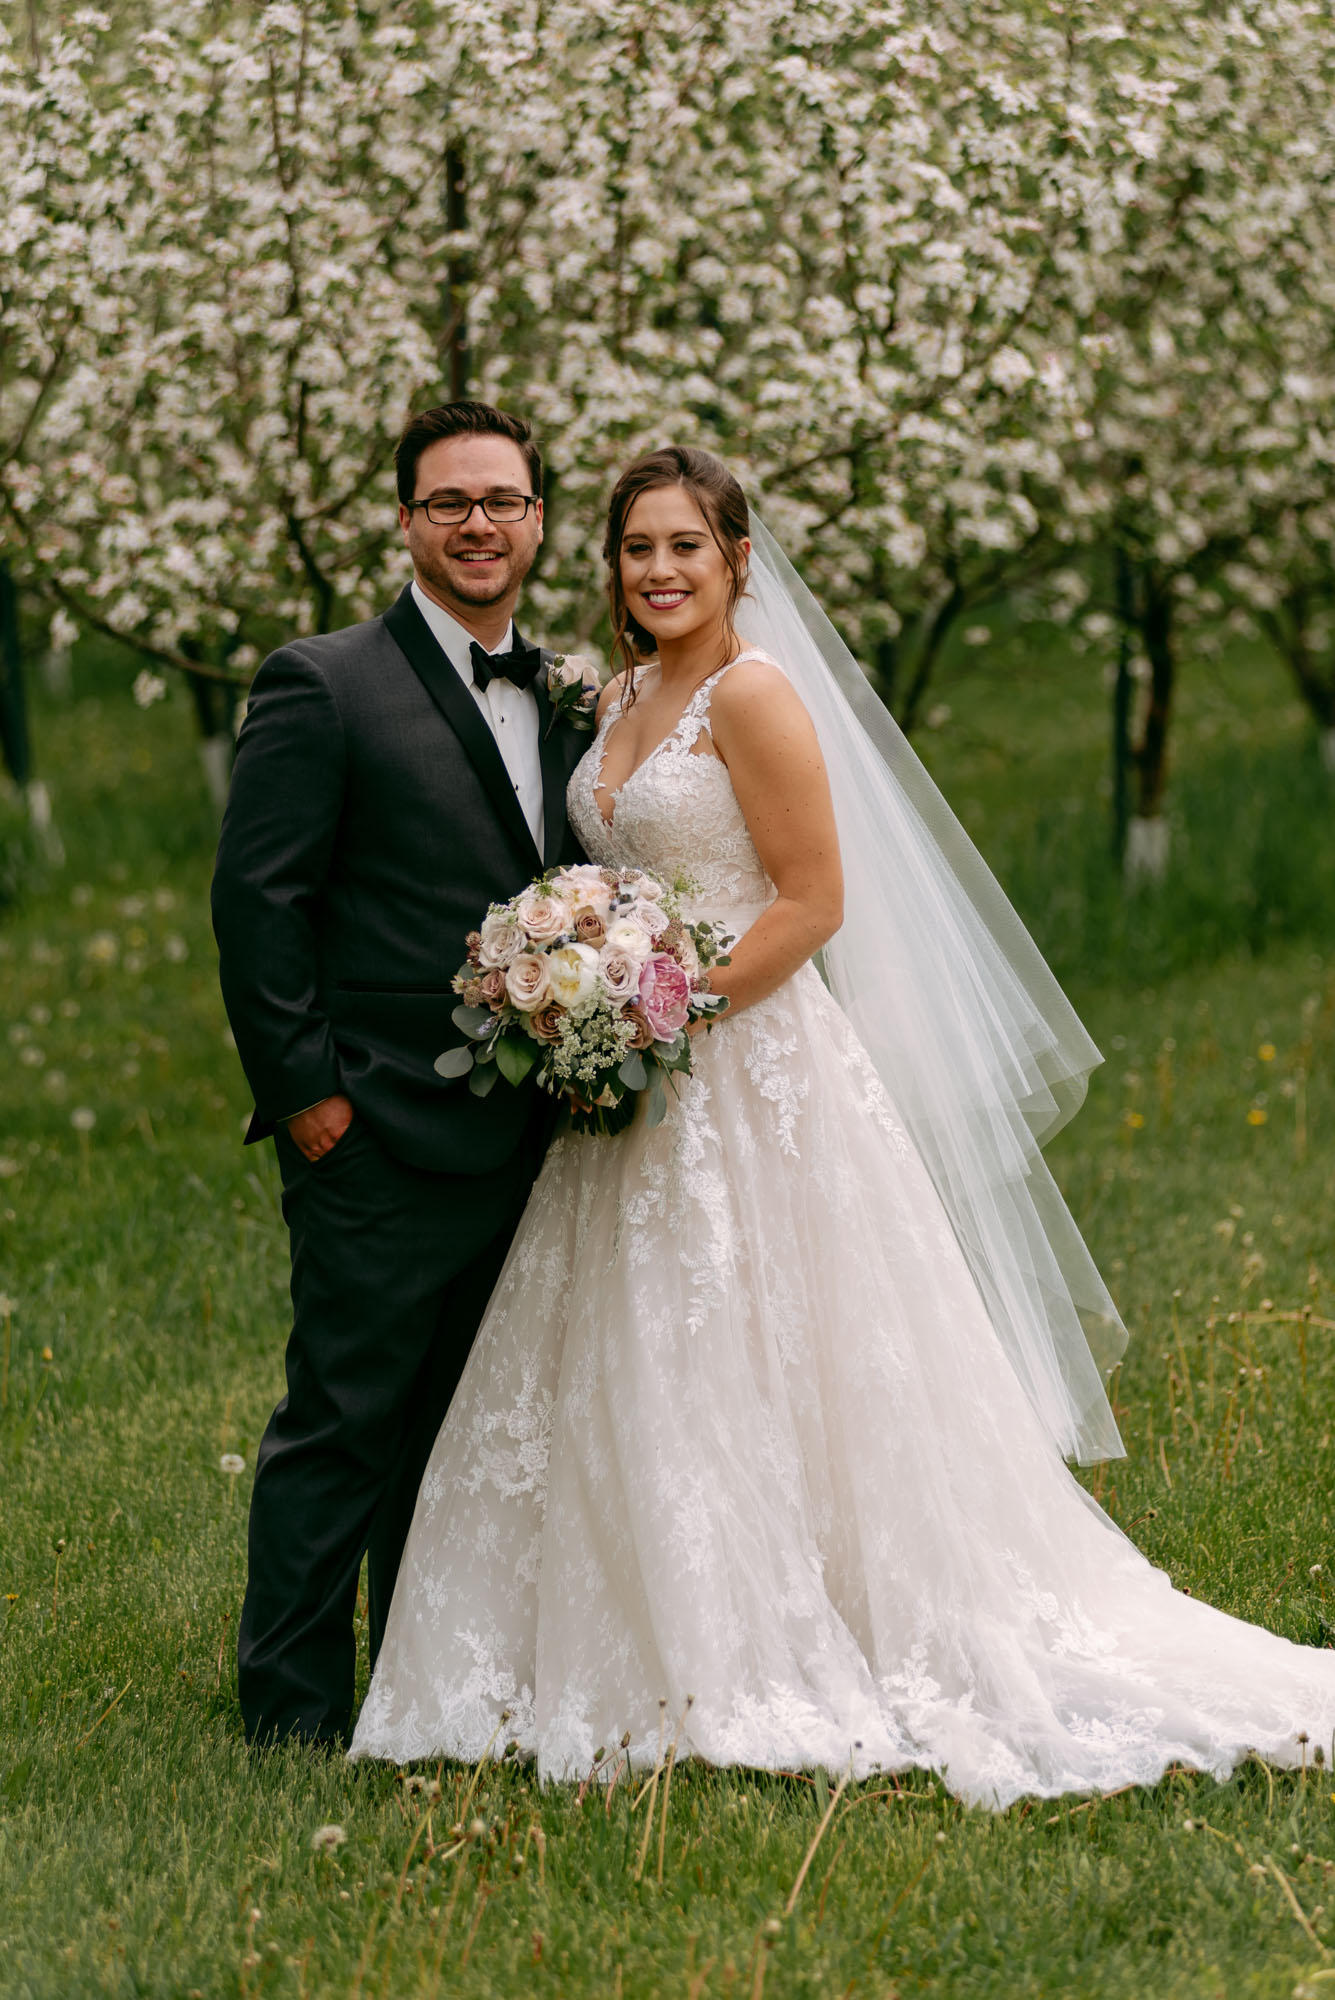 orchard-ridge-farms-pavillion-Rockton-IL-wedding-photographers-5.jpg